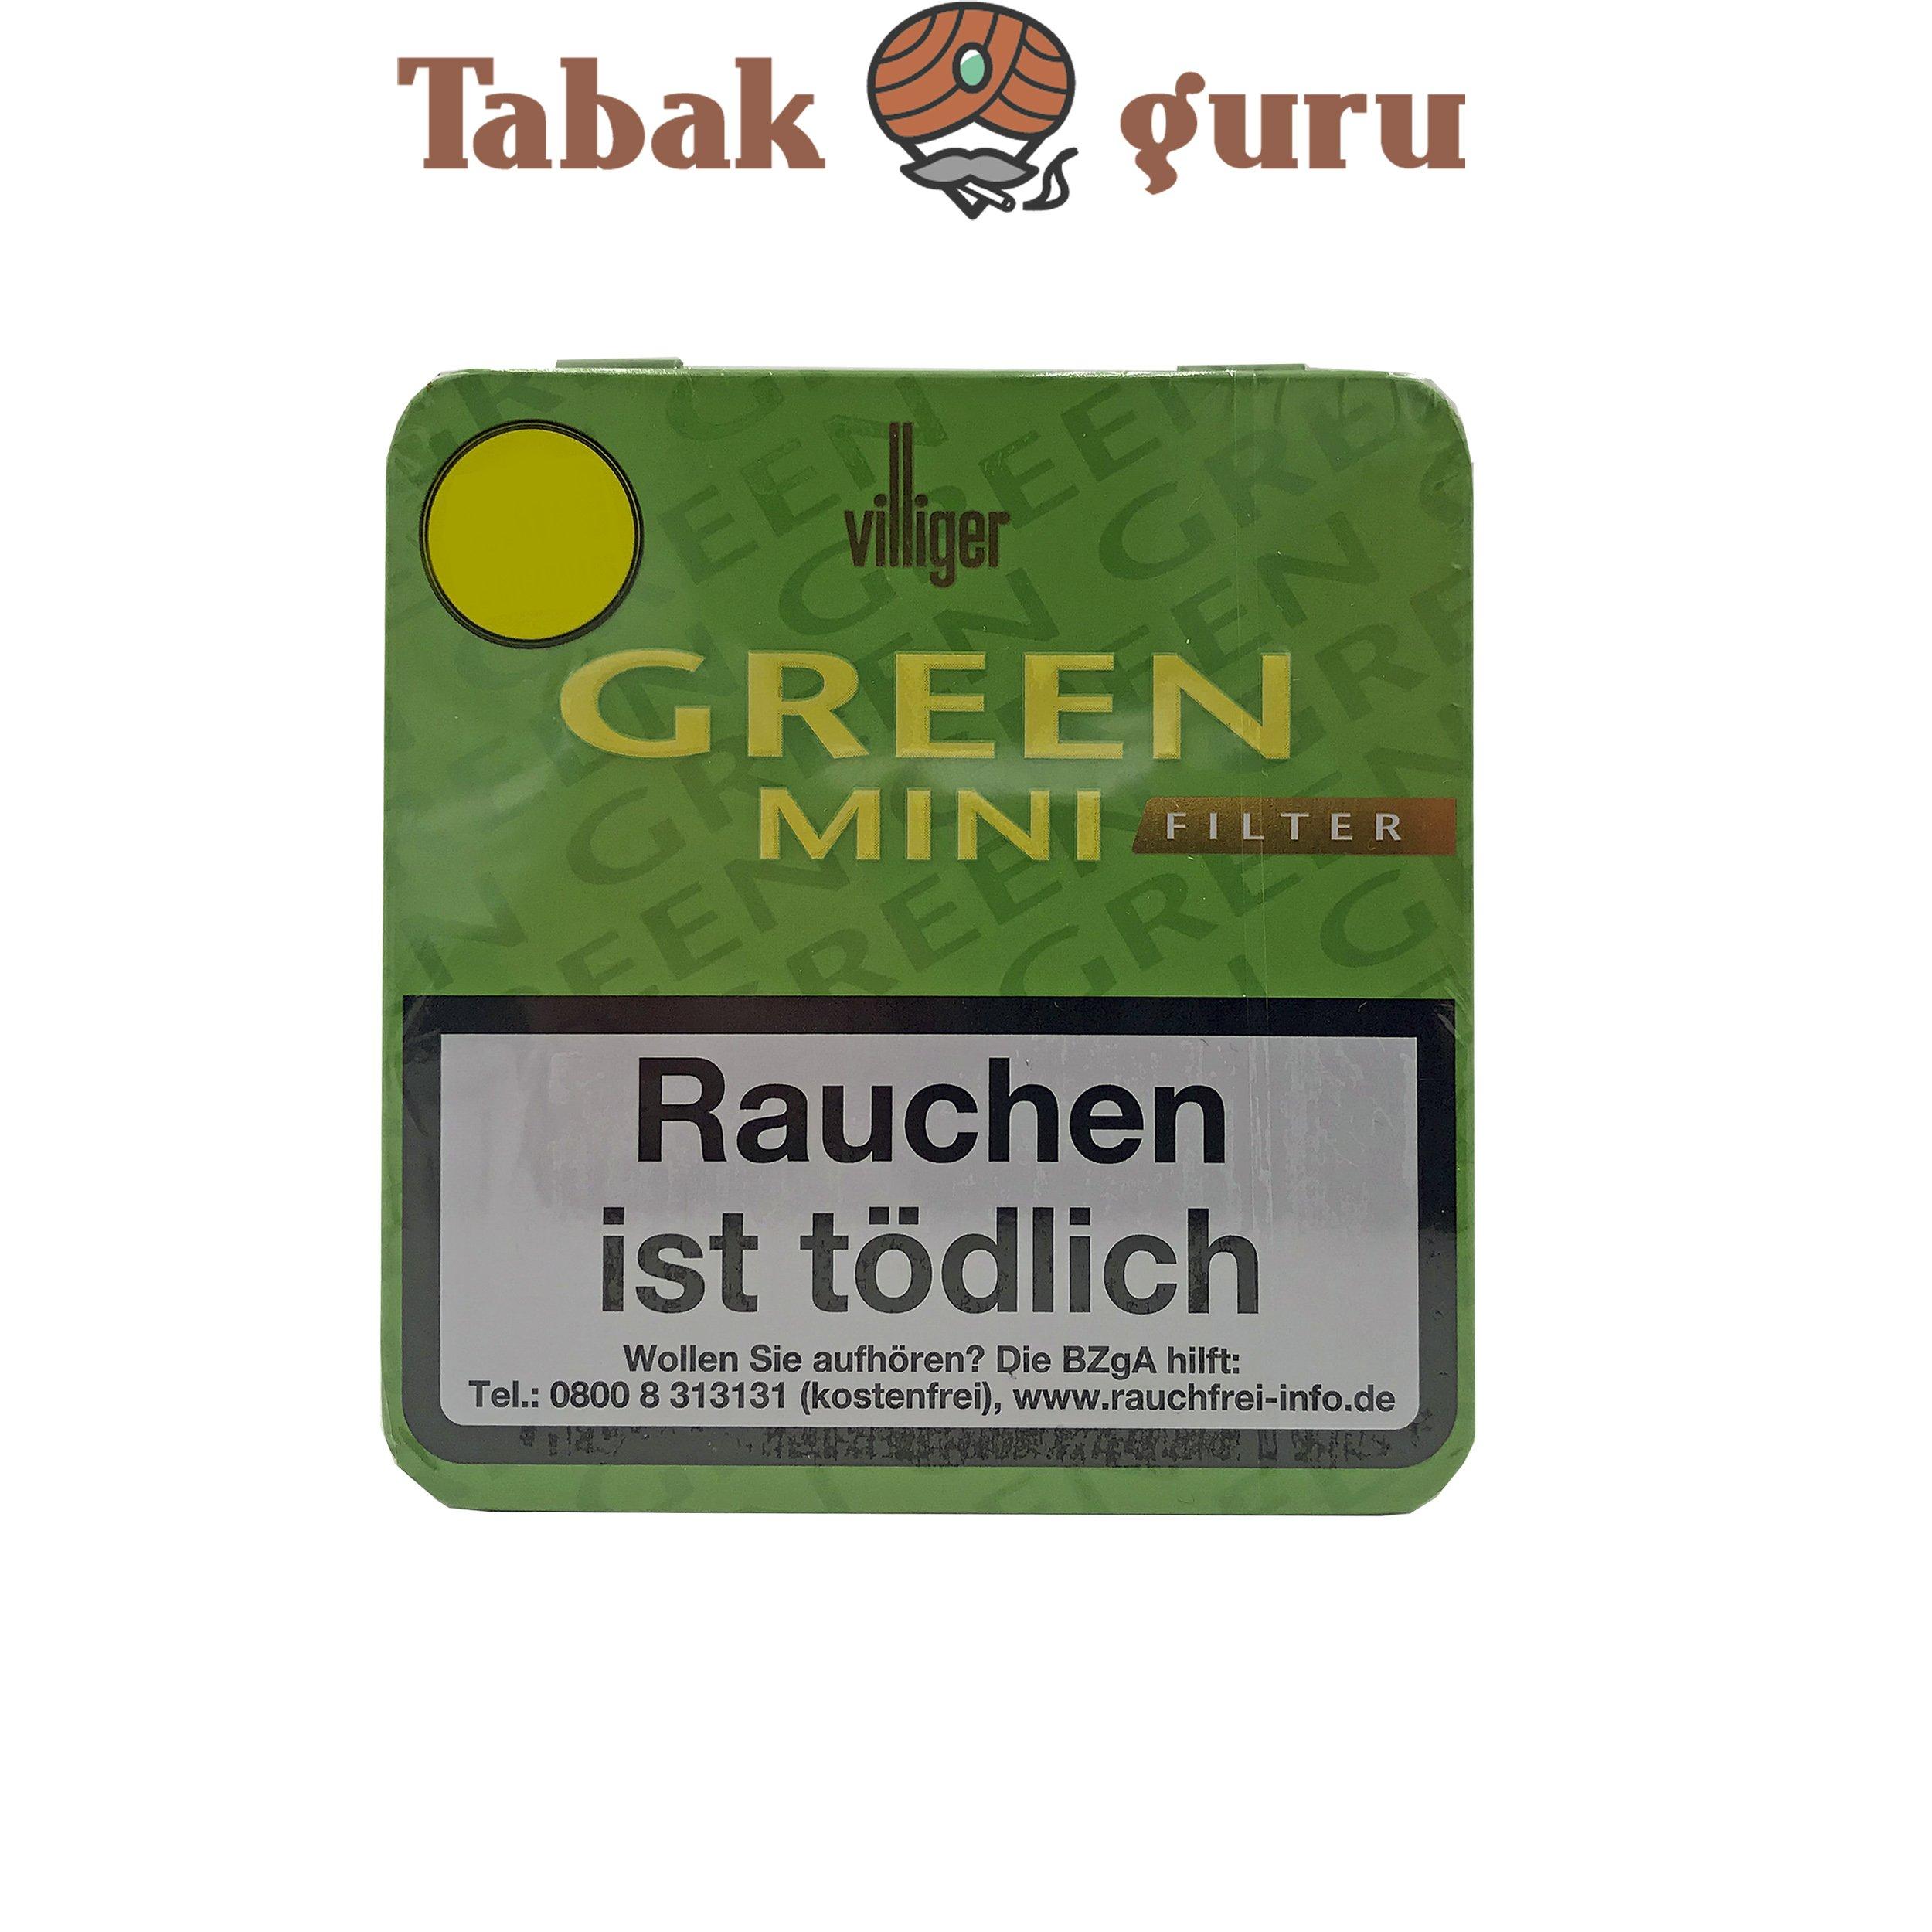 Villiger Green Mini Filterzigarillos a 20 Stück